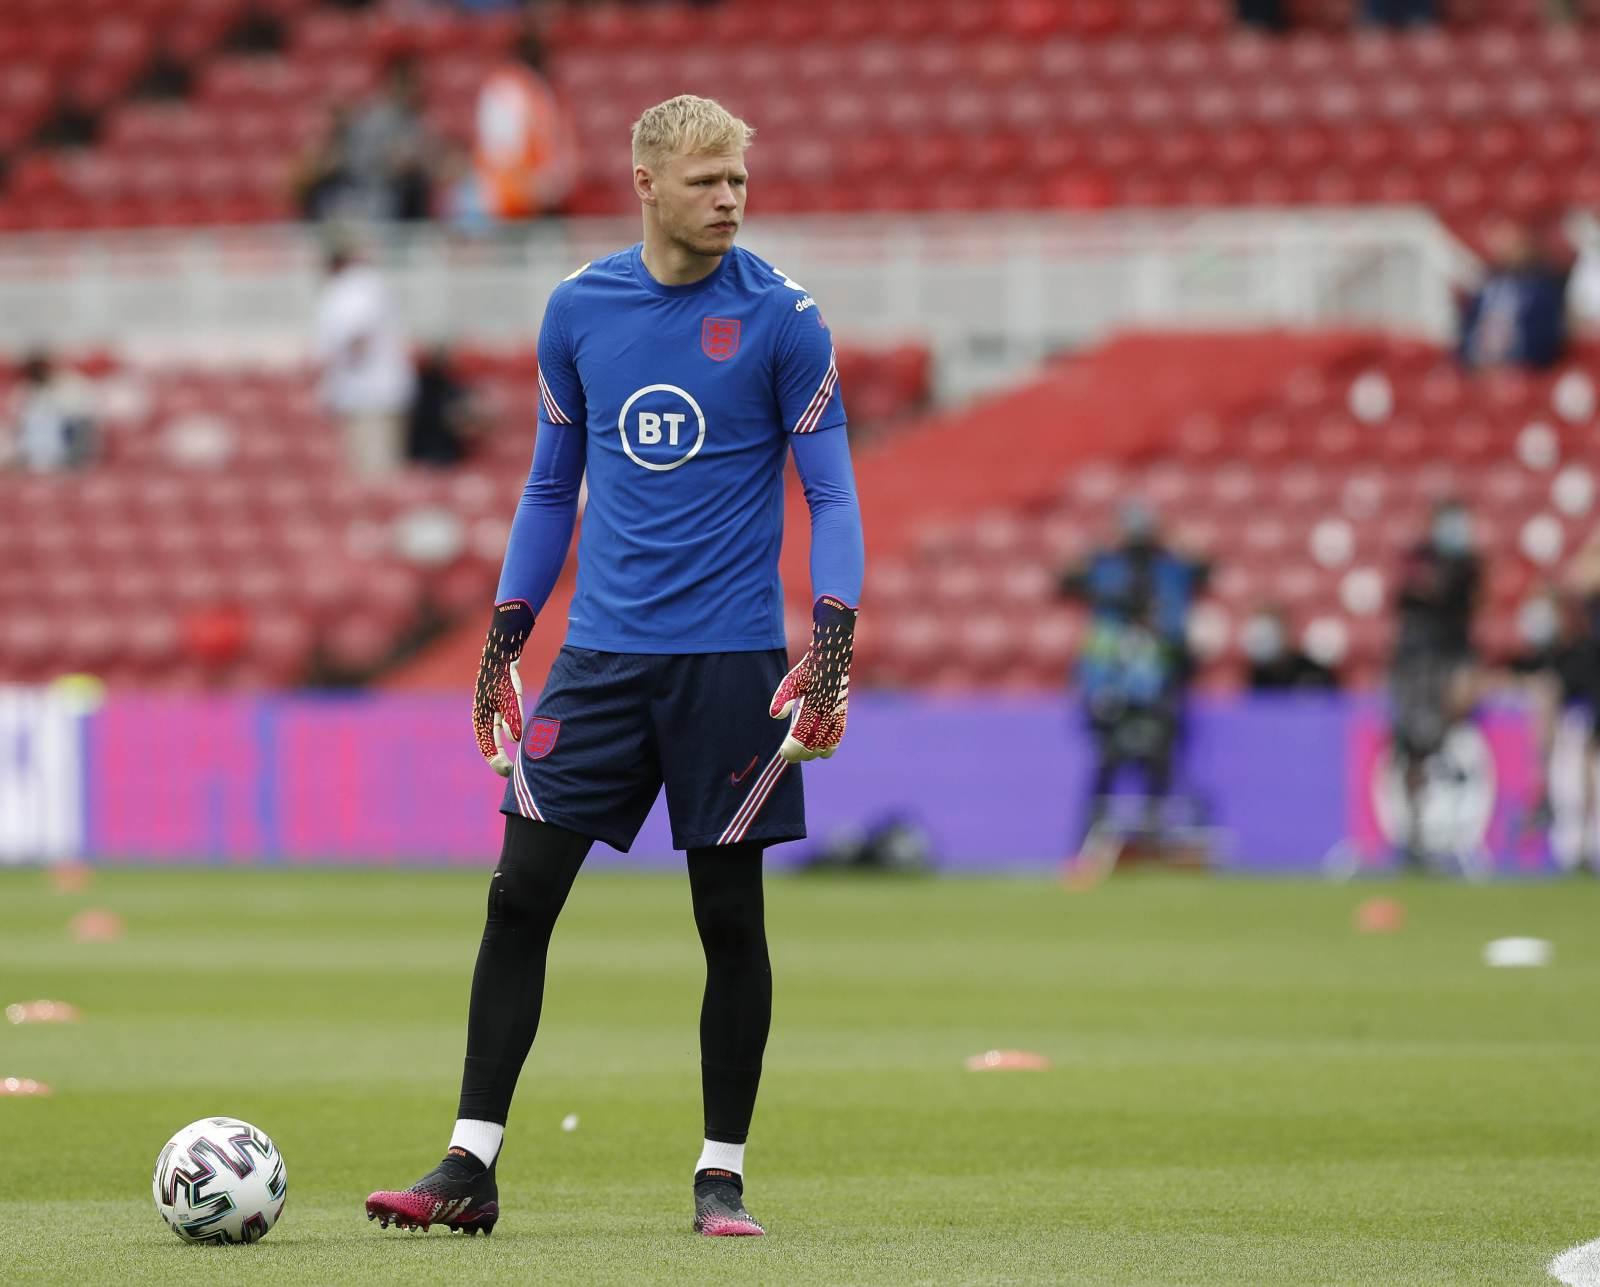 Рамсдейл стал игроком «Арсенала»